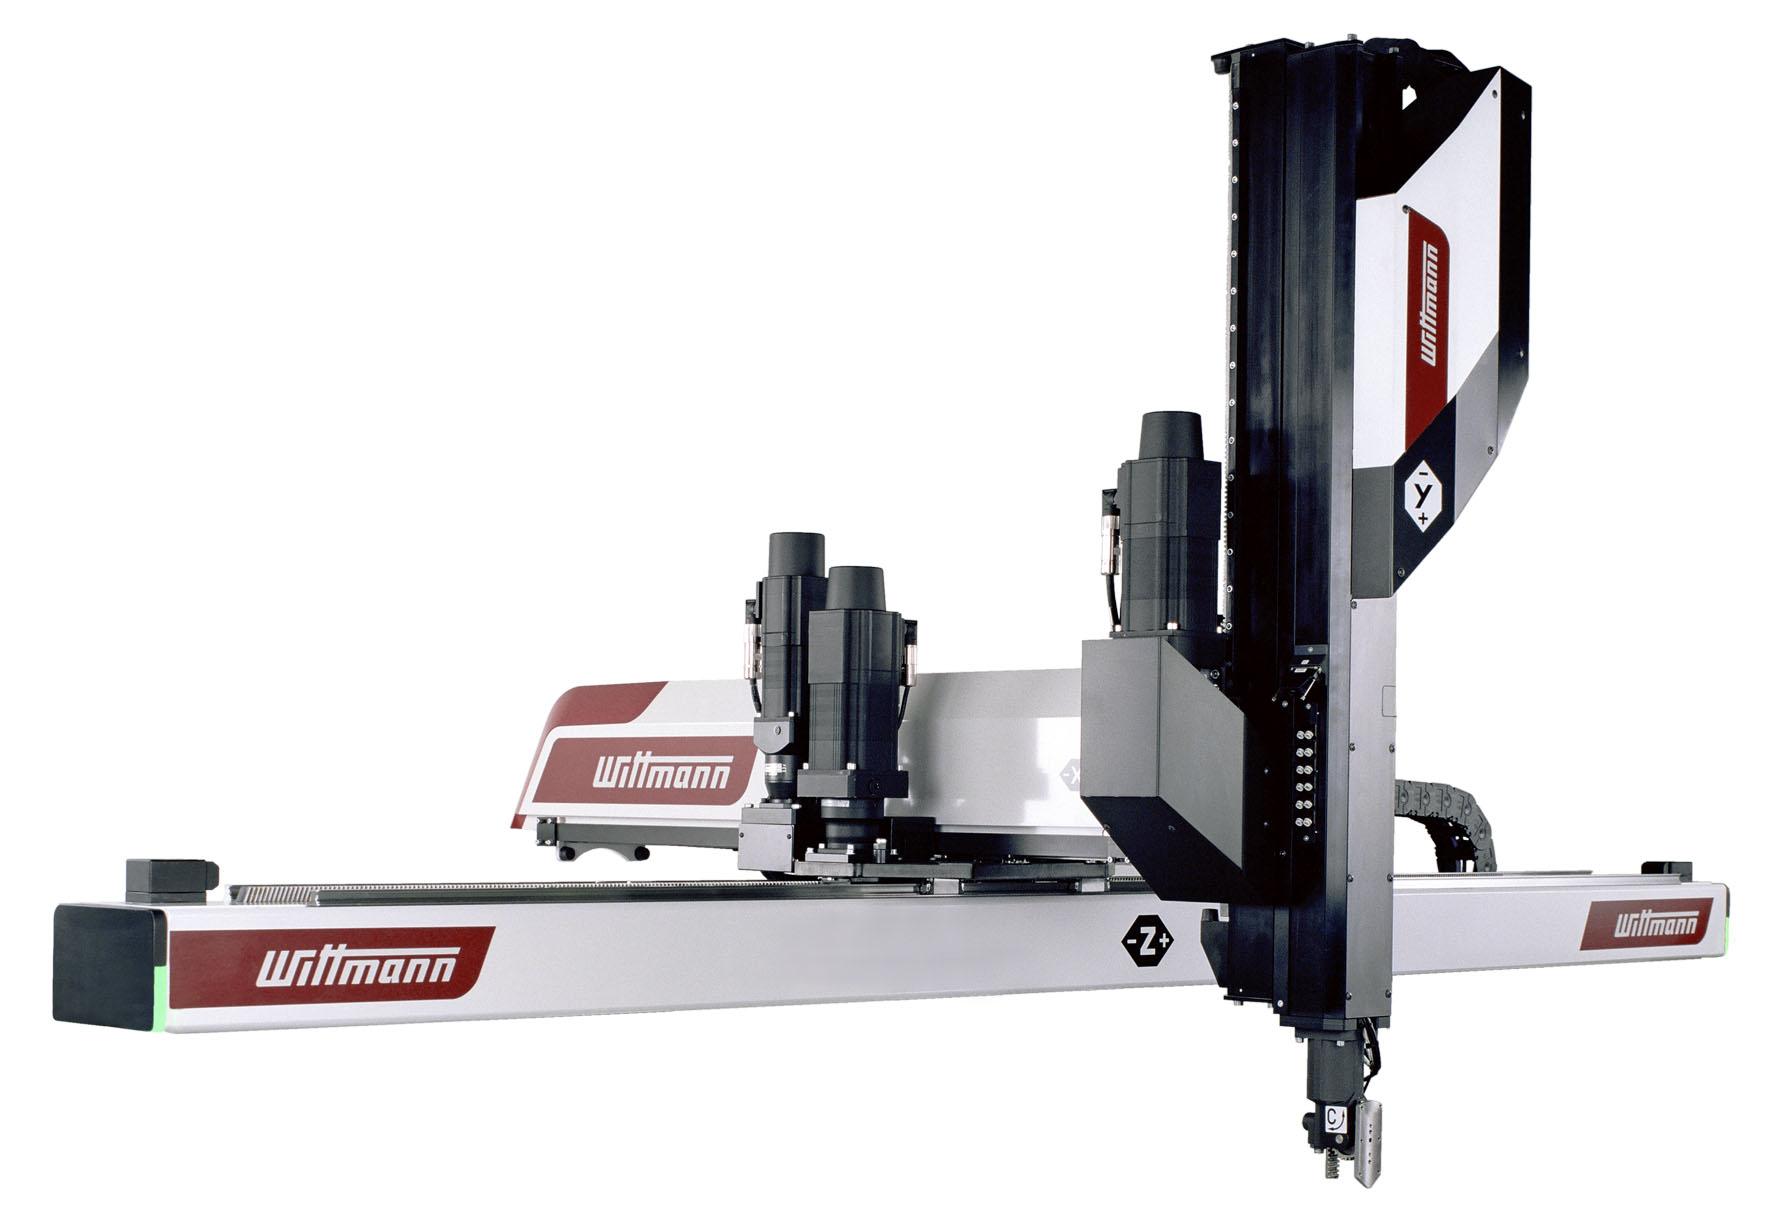 The latest WITTMANN equipment at Plastpol 2014